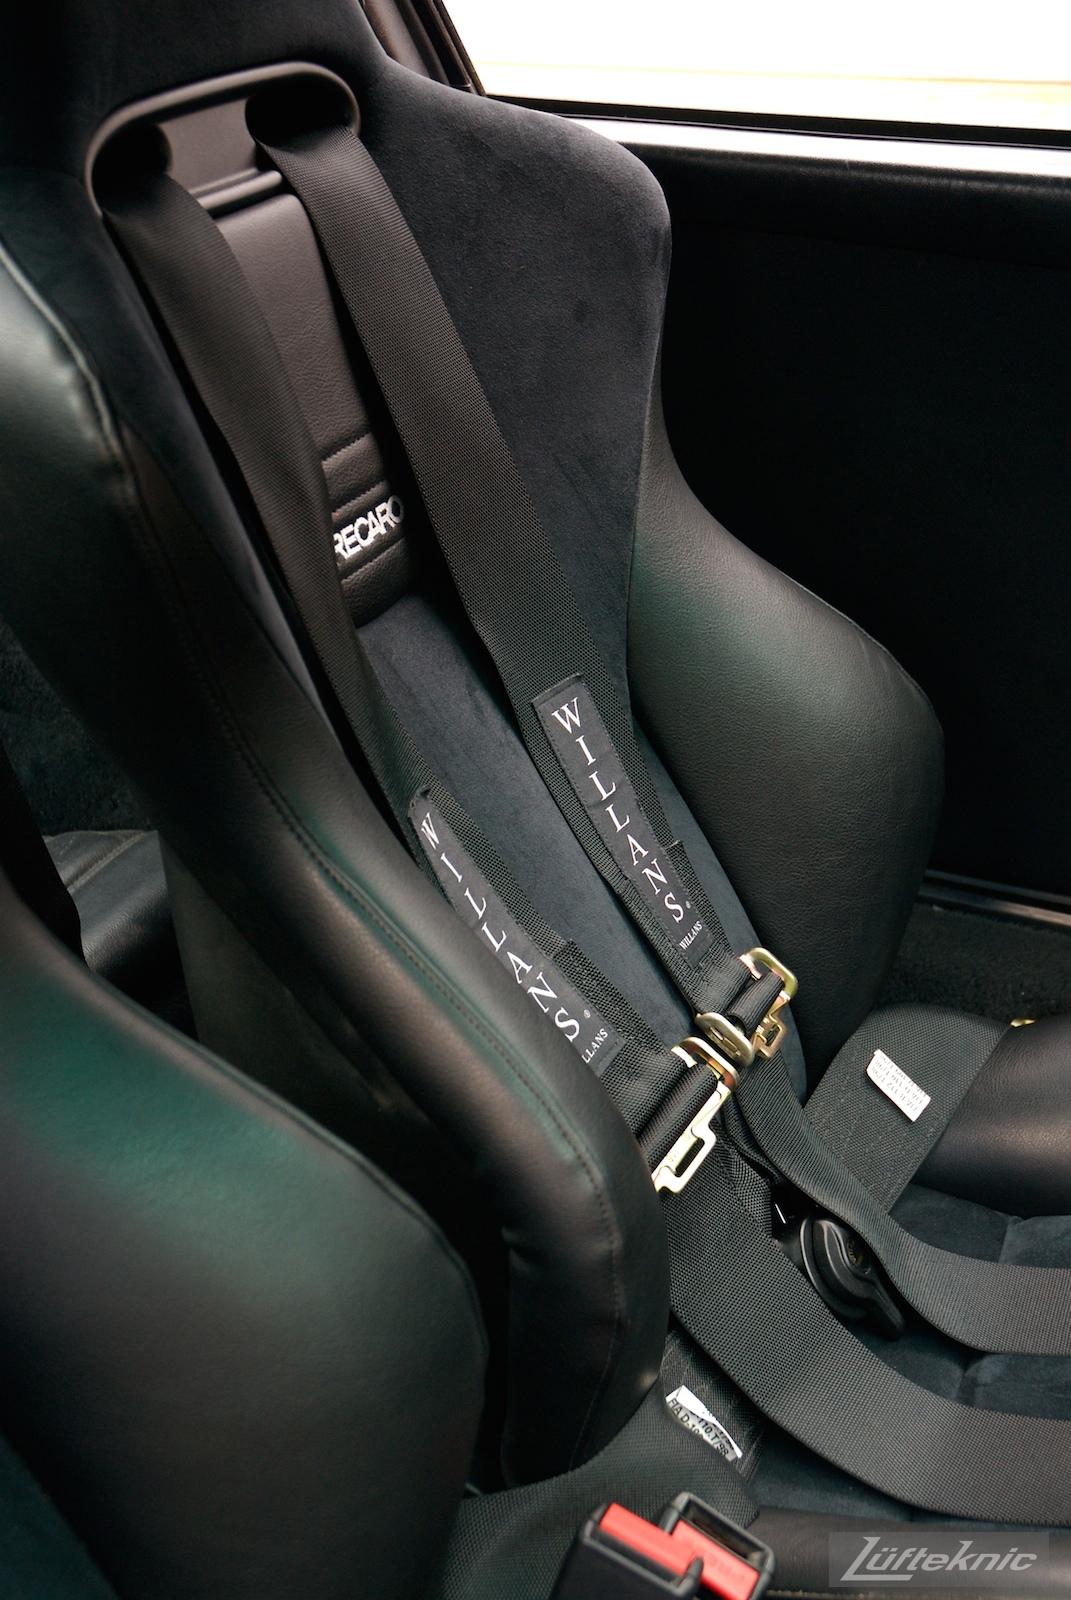 Recaro seat with Willans harness.